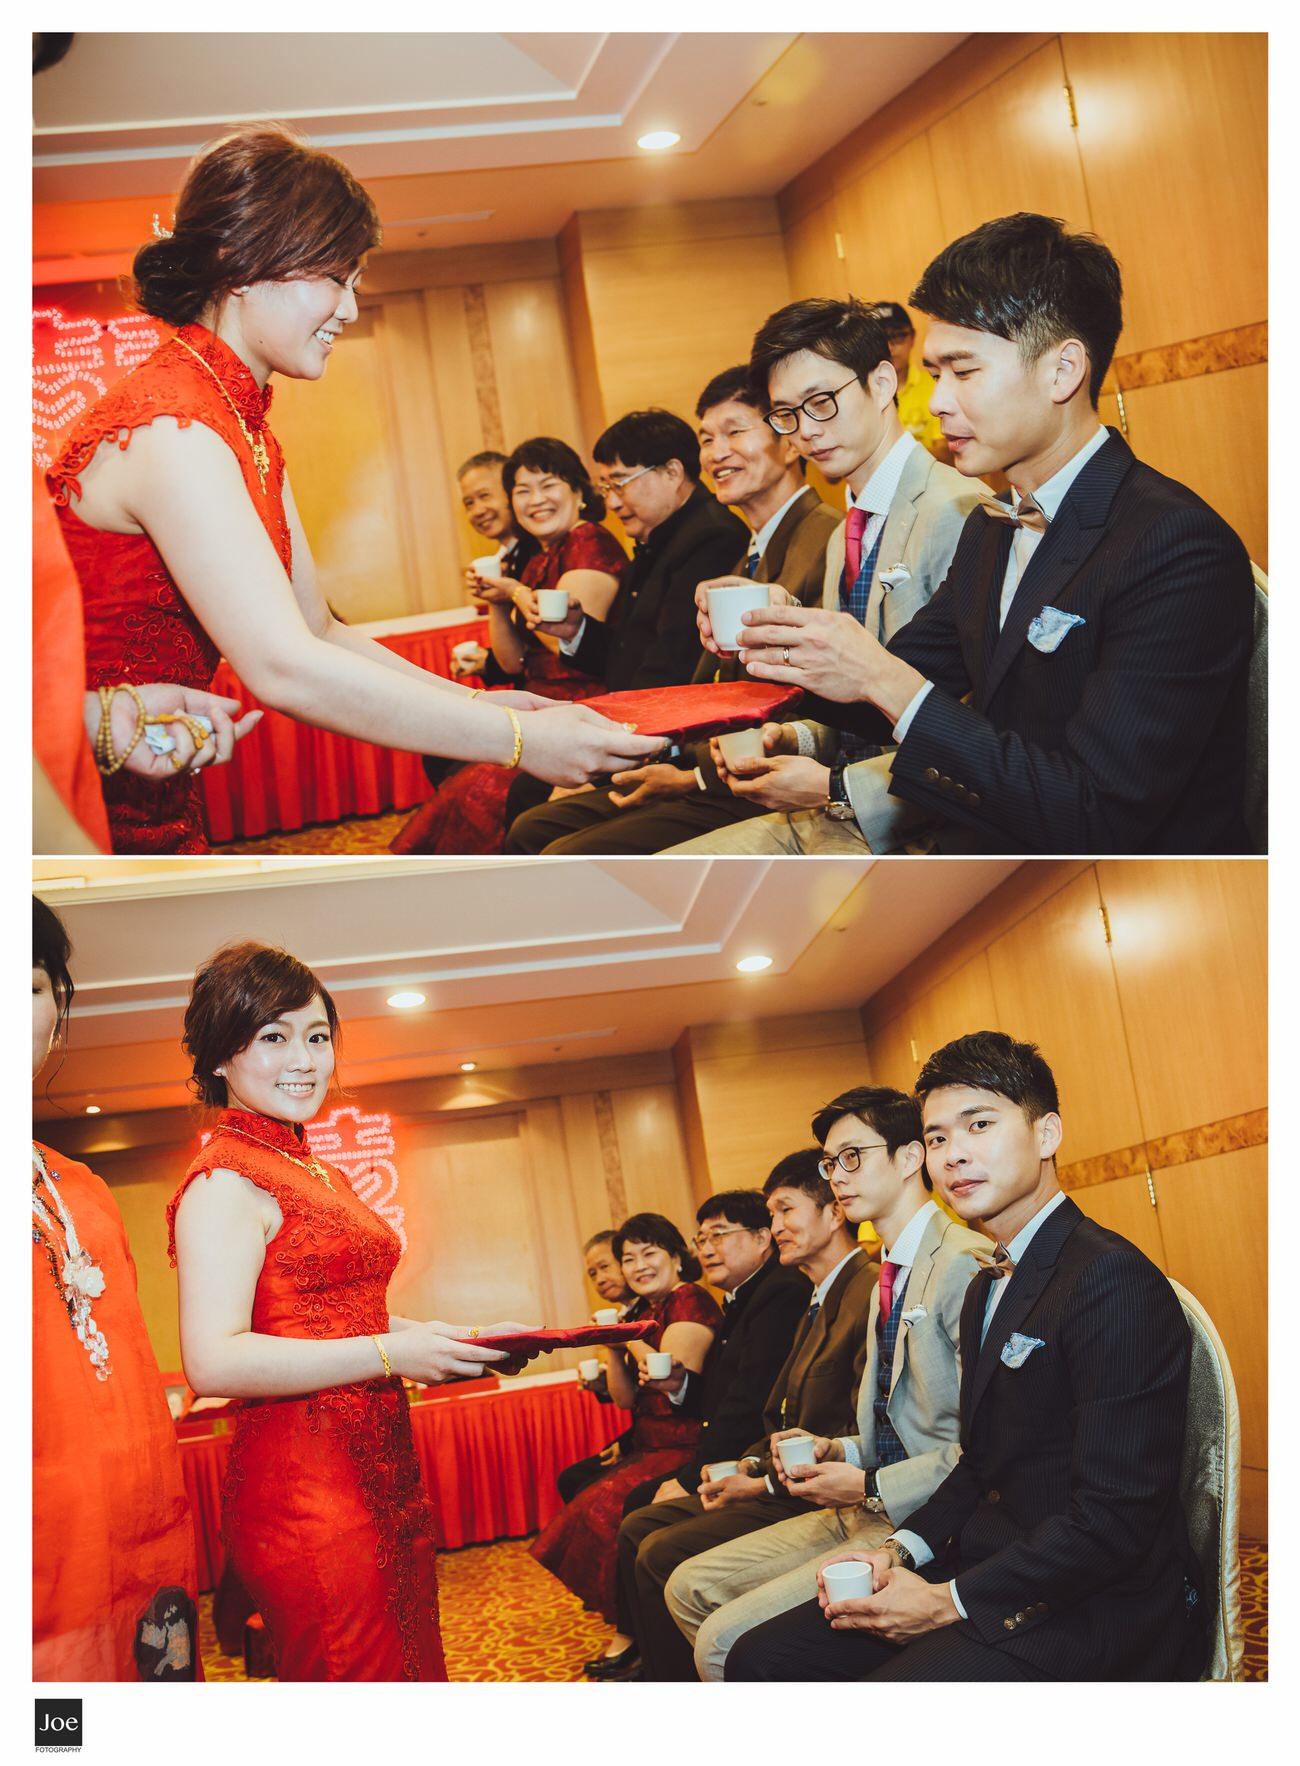 sunworld-dynasty-hotel-taipei-wedding-photo-joe-fotography-angel-jay-014.jpg